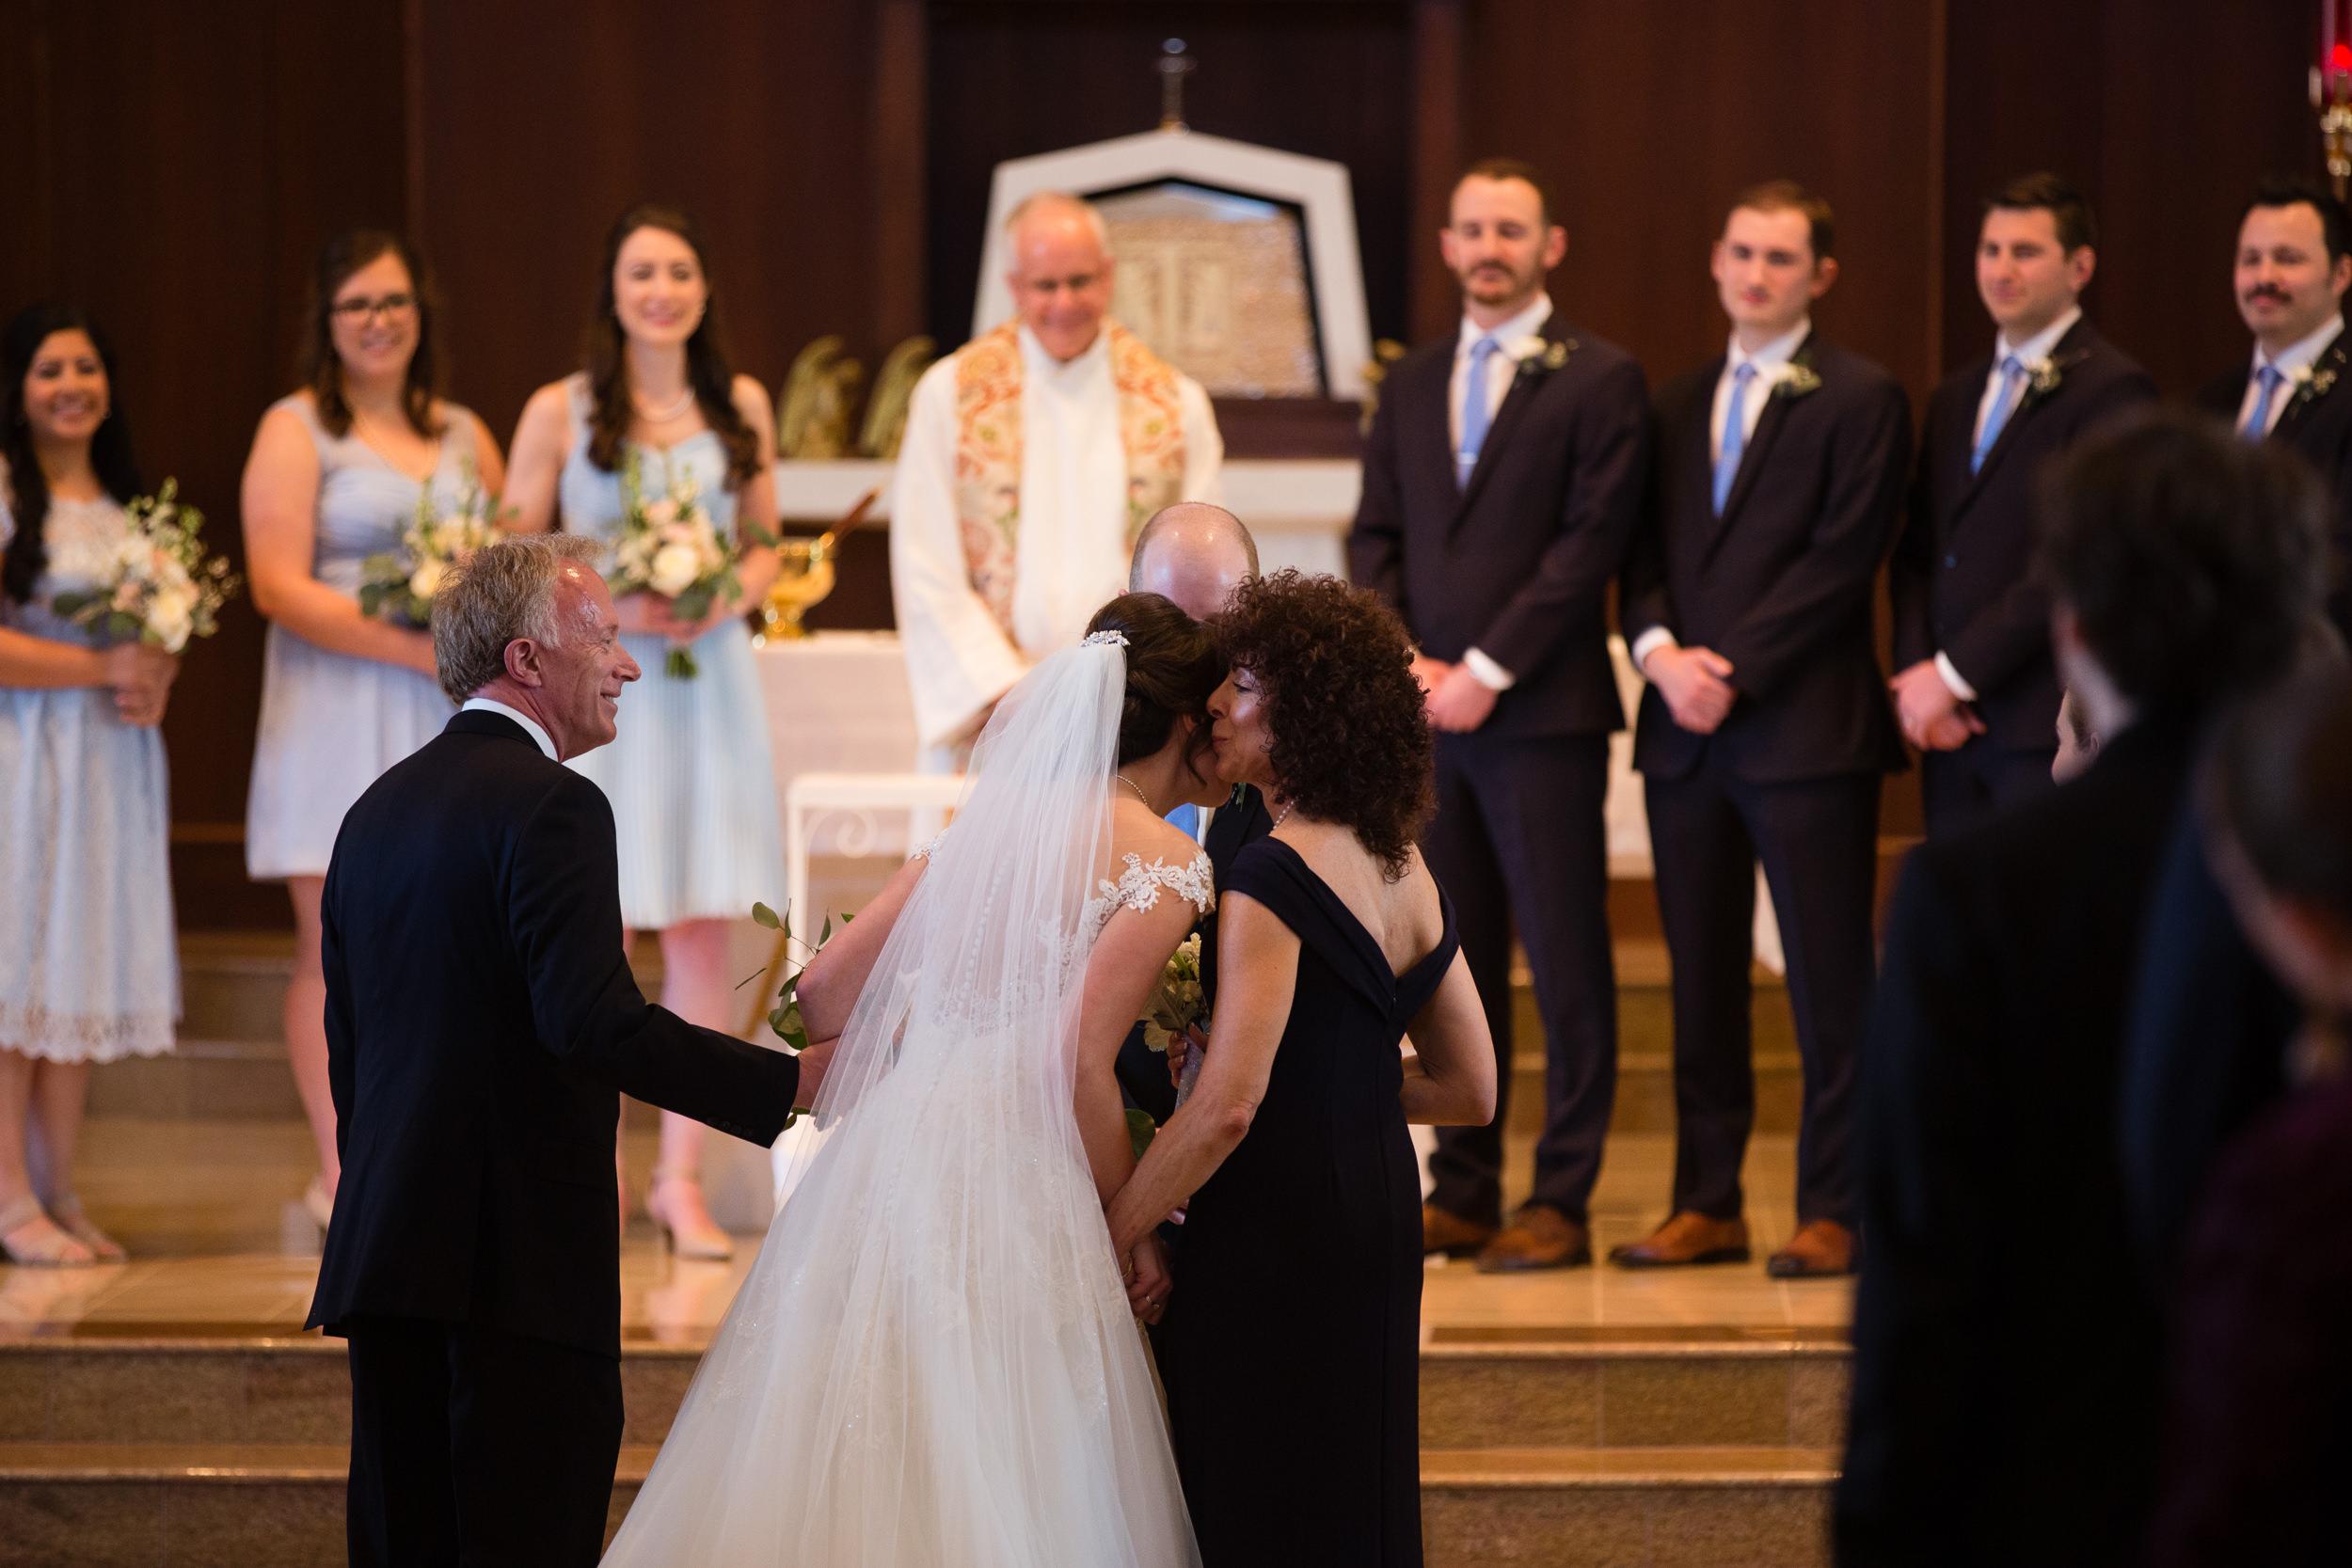 AB_Auburn_Wedding_2019-00031.jpg